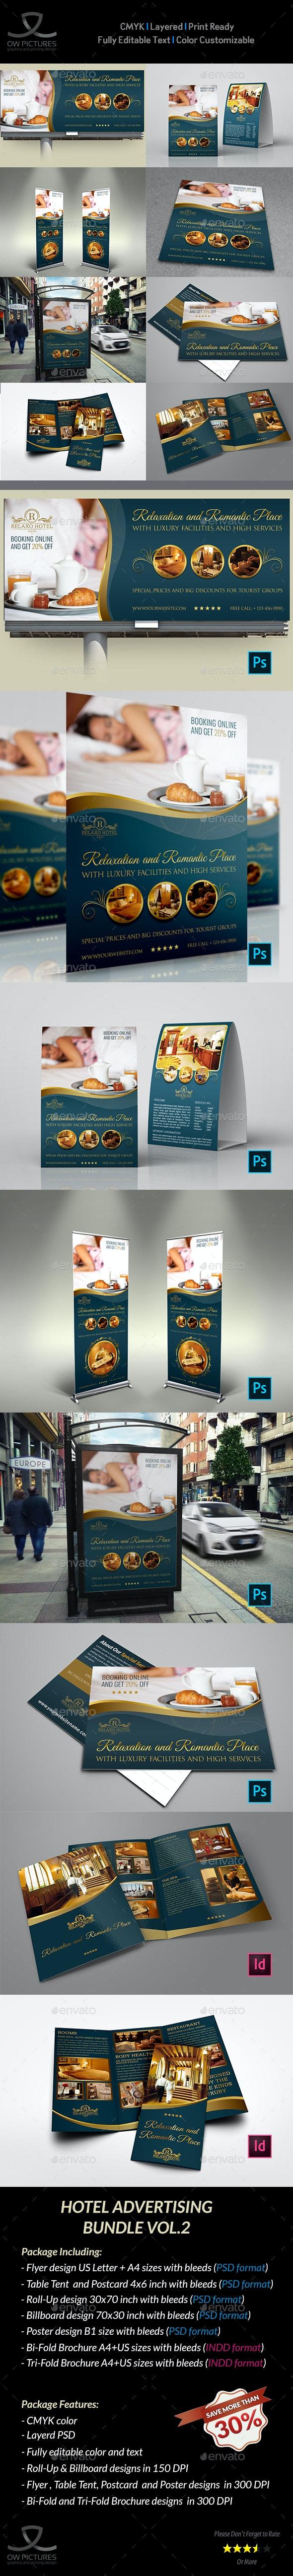 Hotel Advertising Bundle Vol.2 - Signage Print Templates